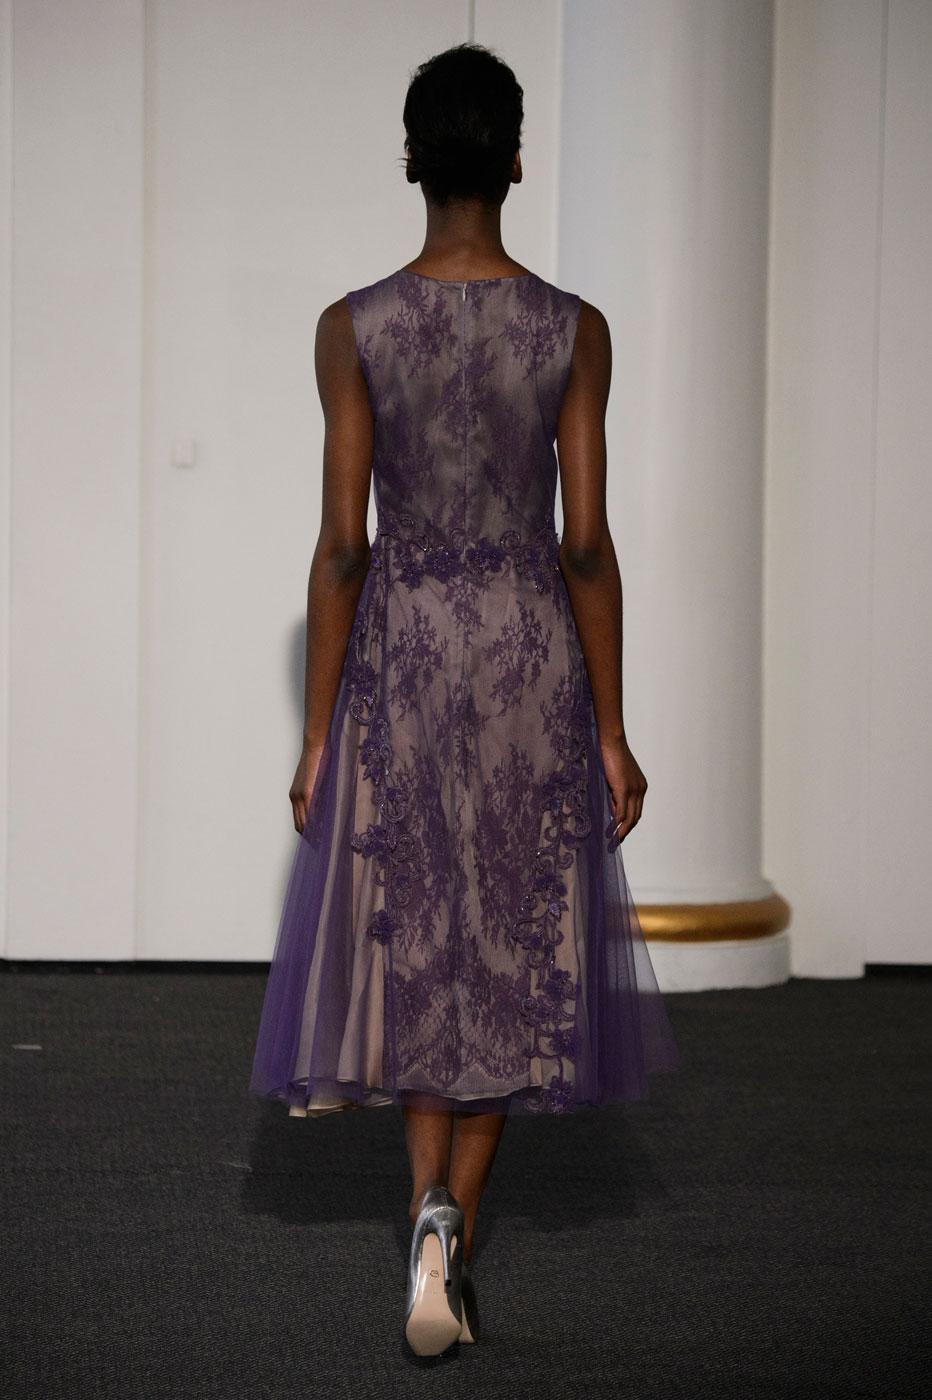 Busardi-fashion-runway-show-haute-couture-paris-spring-2015-the-impression-42